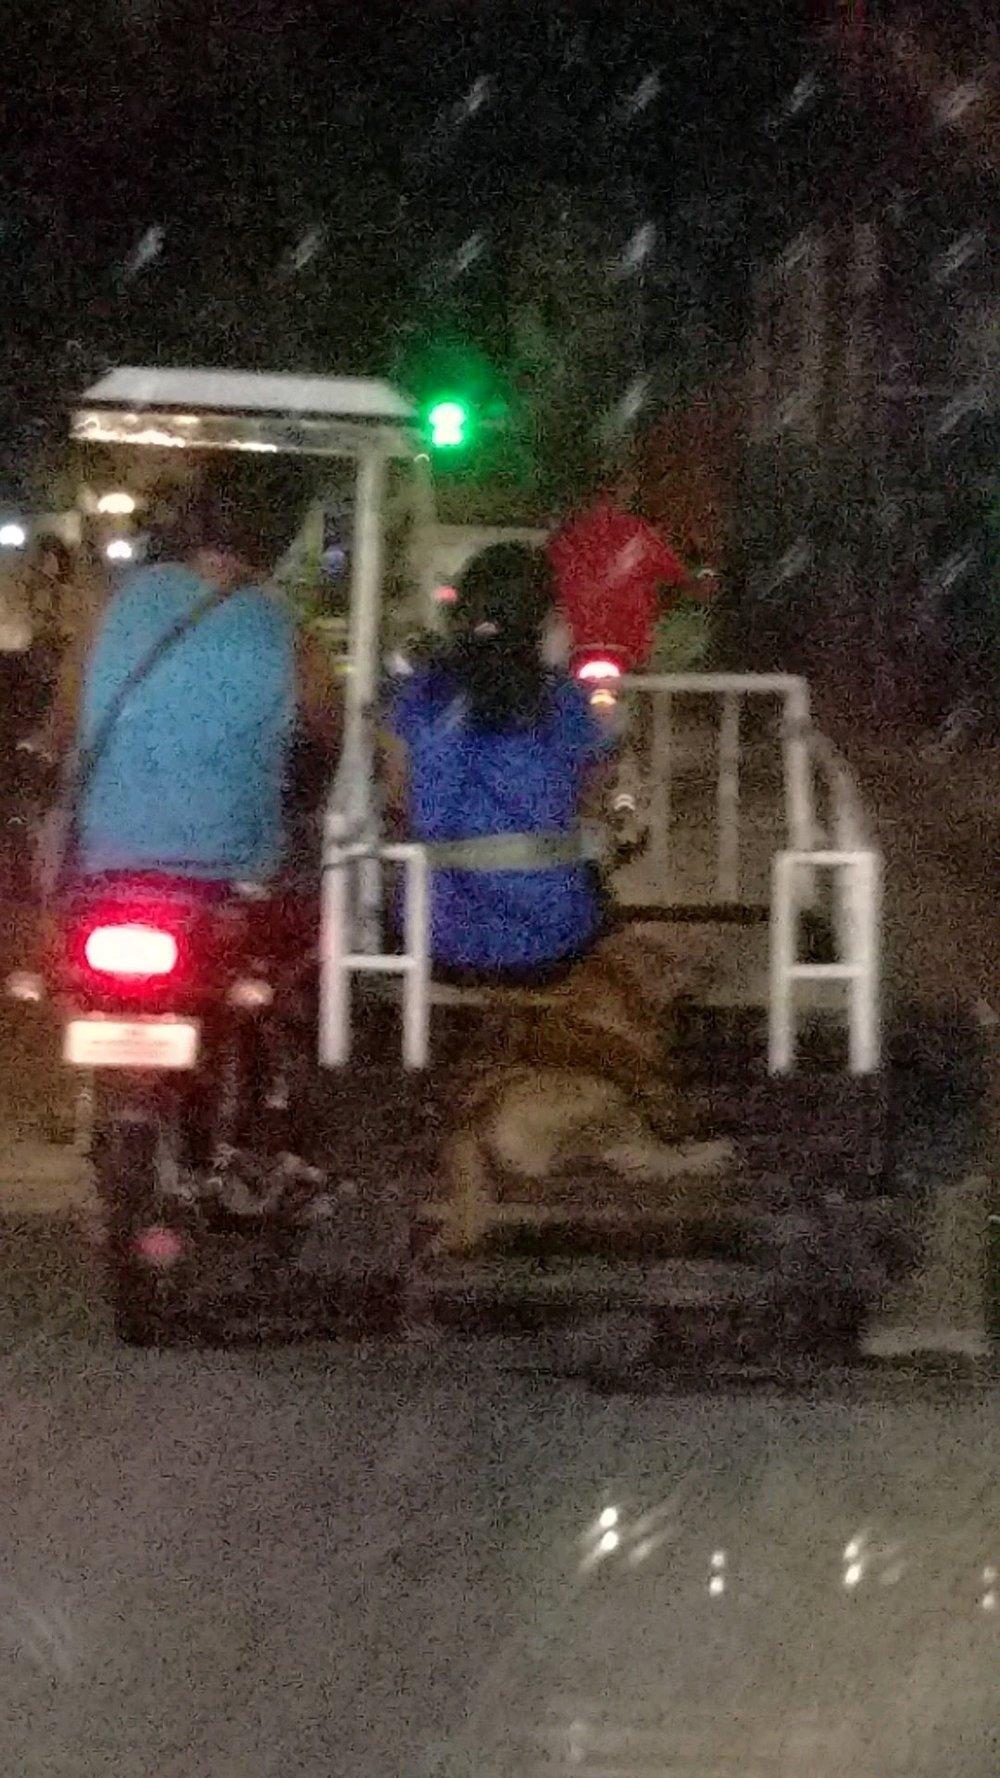 Doggo ride